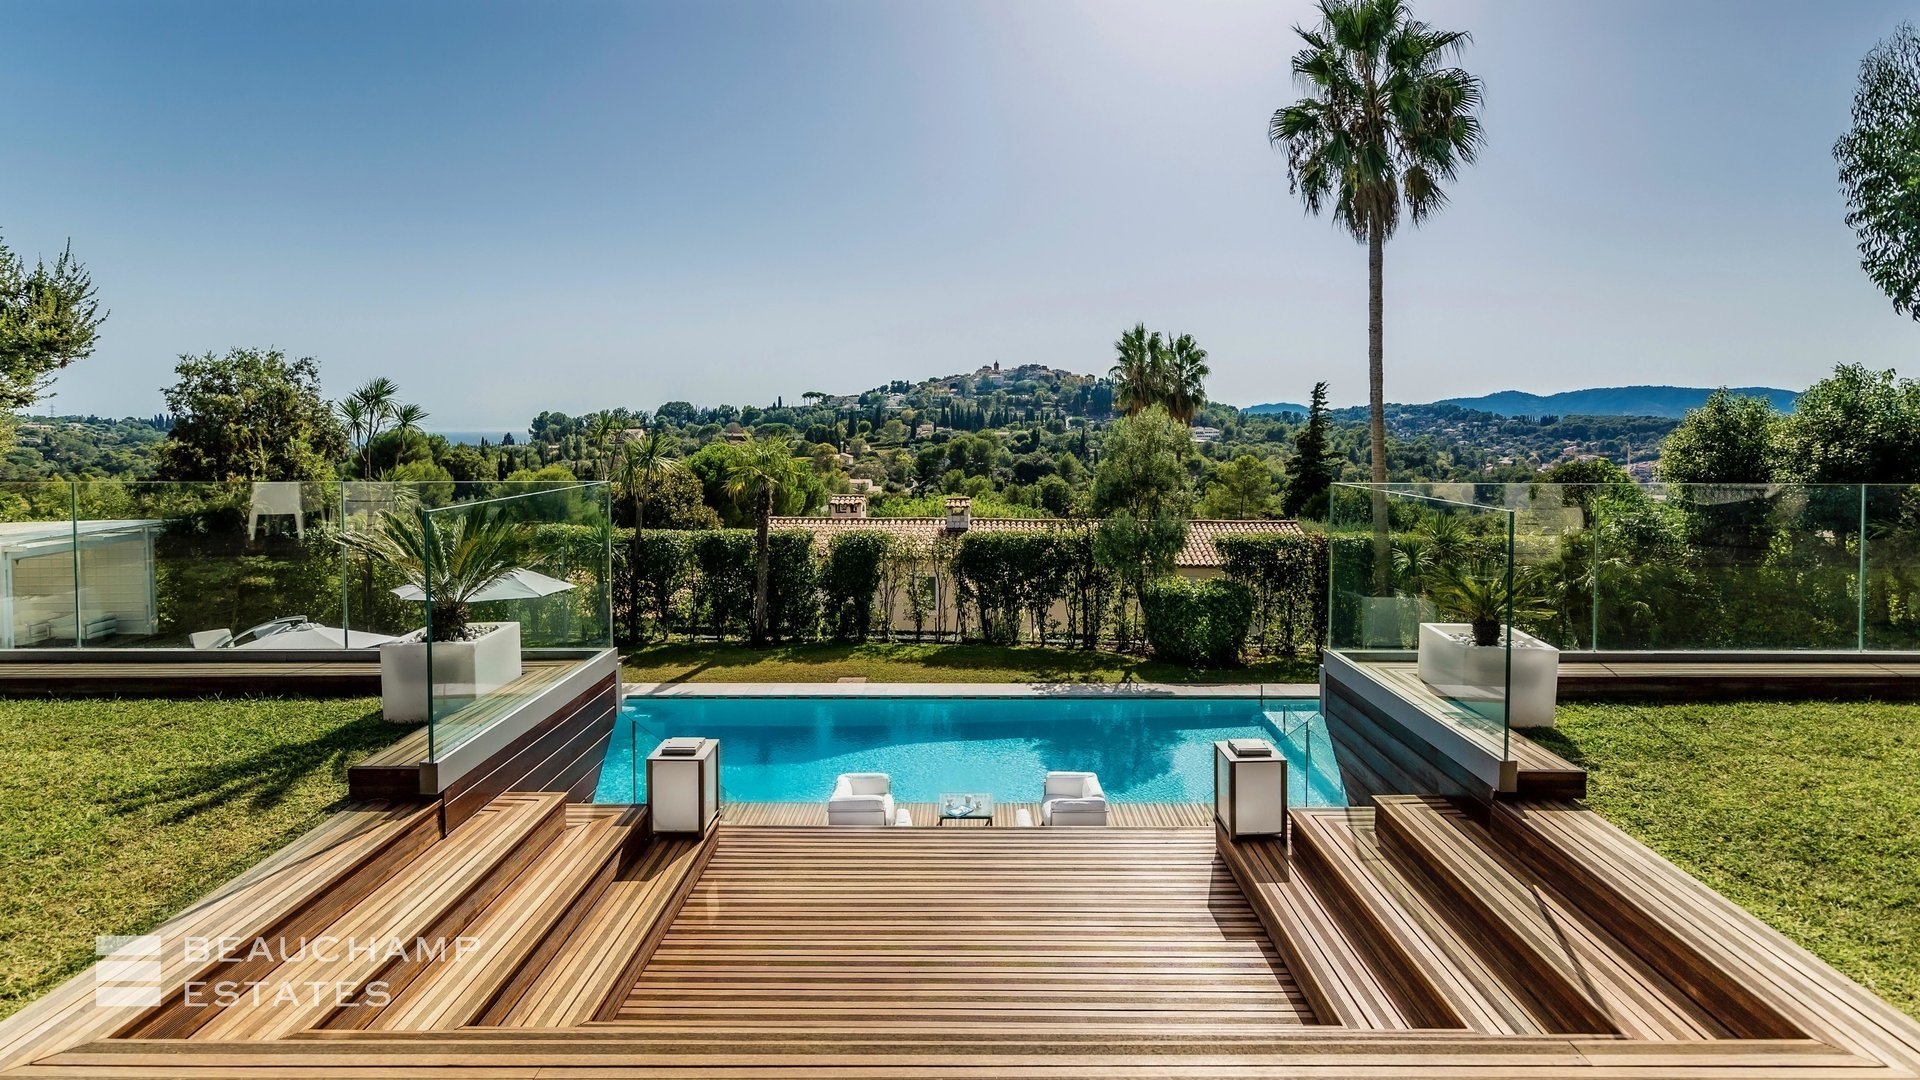 Villa in Mougins, Provence-Alpes-Côte d'Azur, France 1 - 10980642